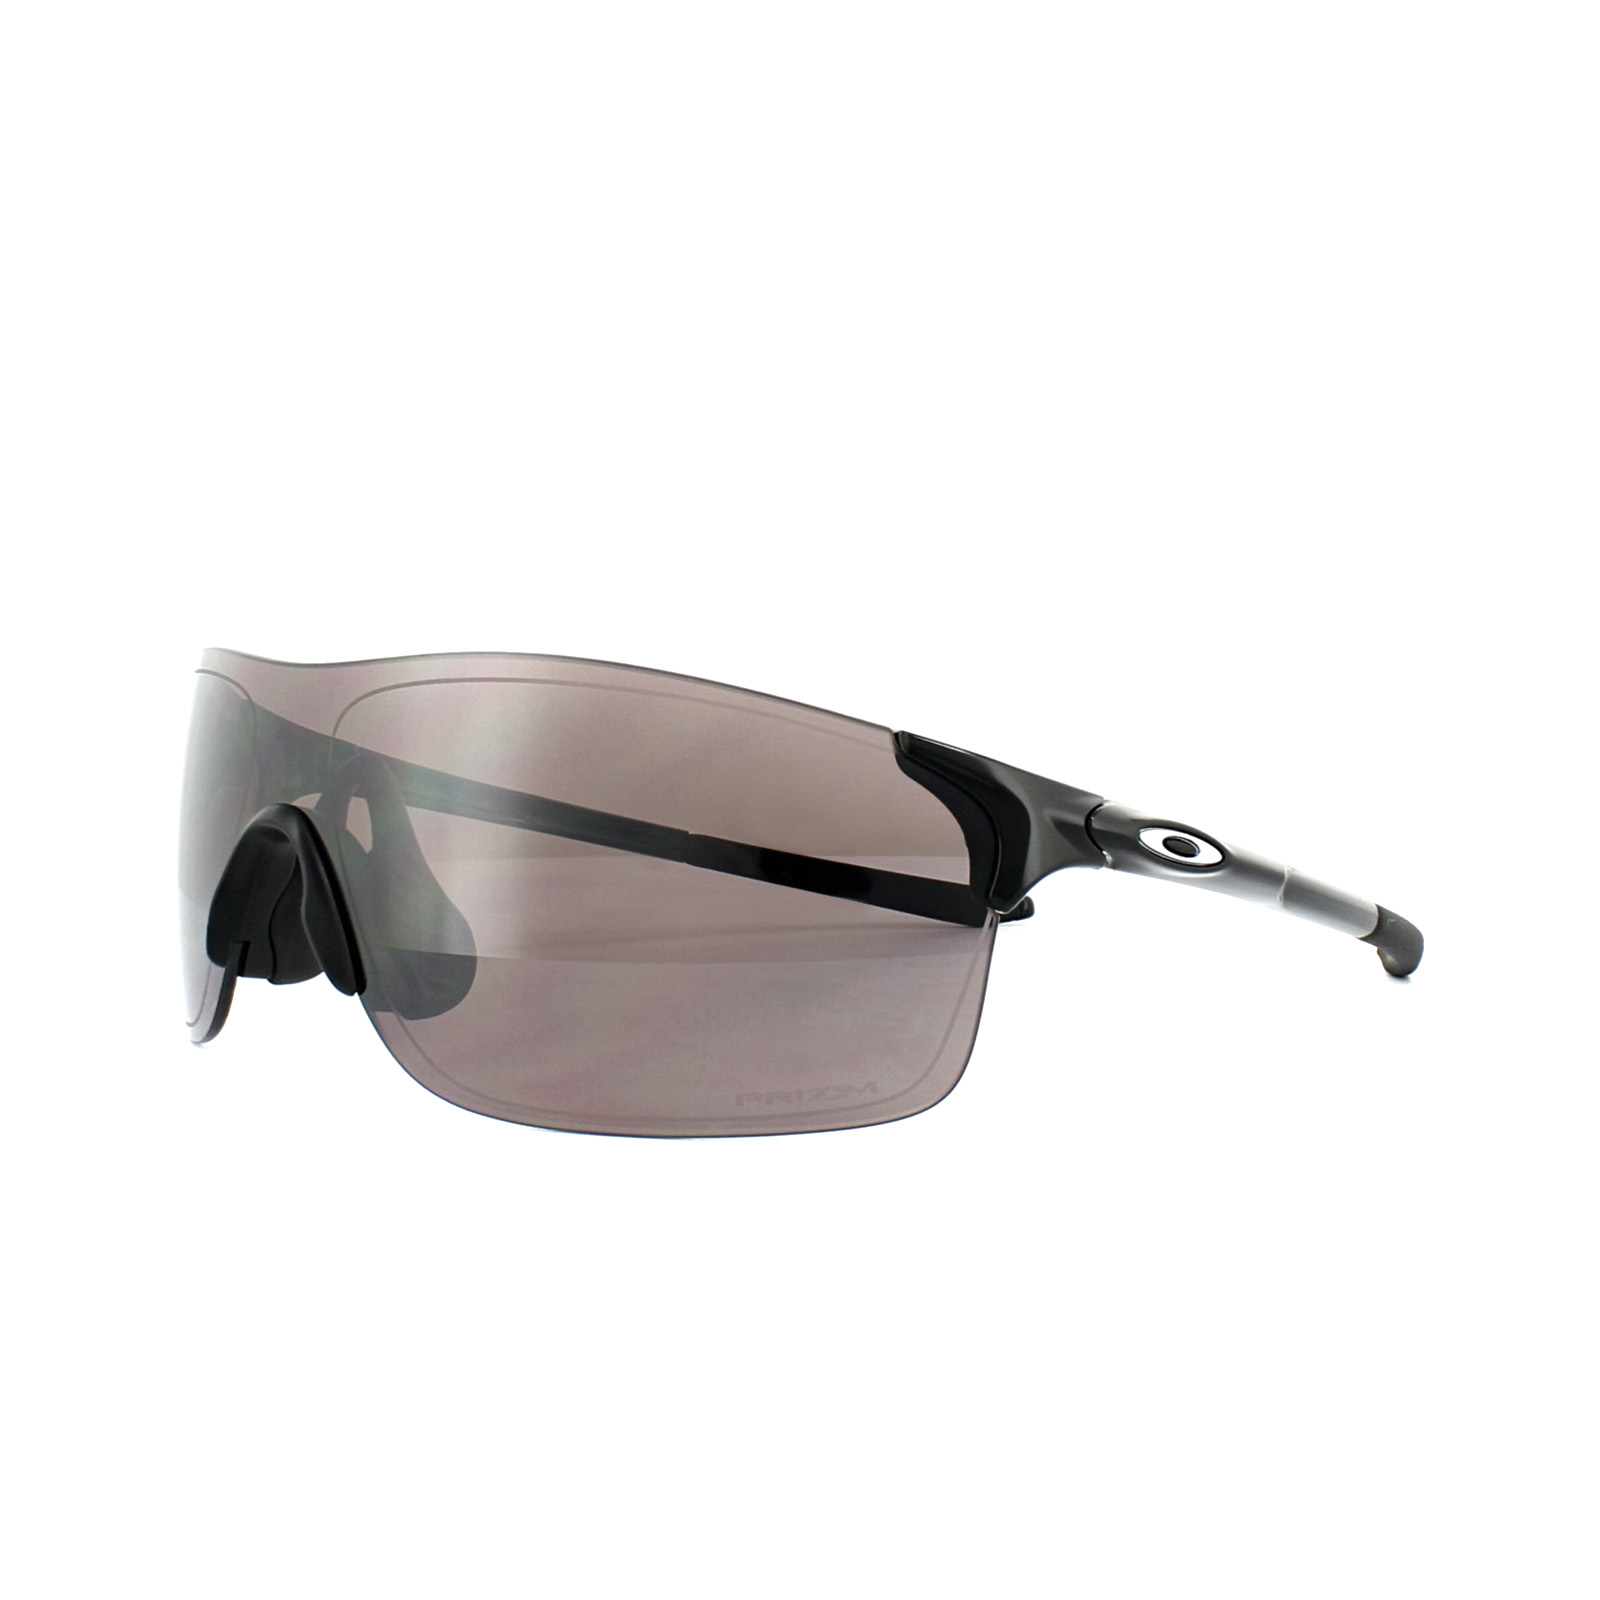 39793e8301 Sentinel Oakley Sunglasses EVZero Pitch OO9383-06 Polished Black Prizm  Daily Polarized